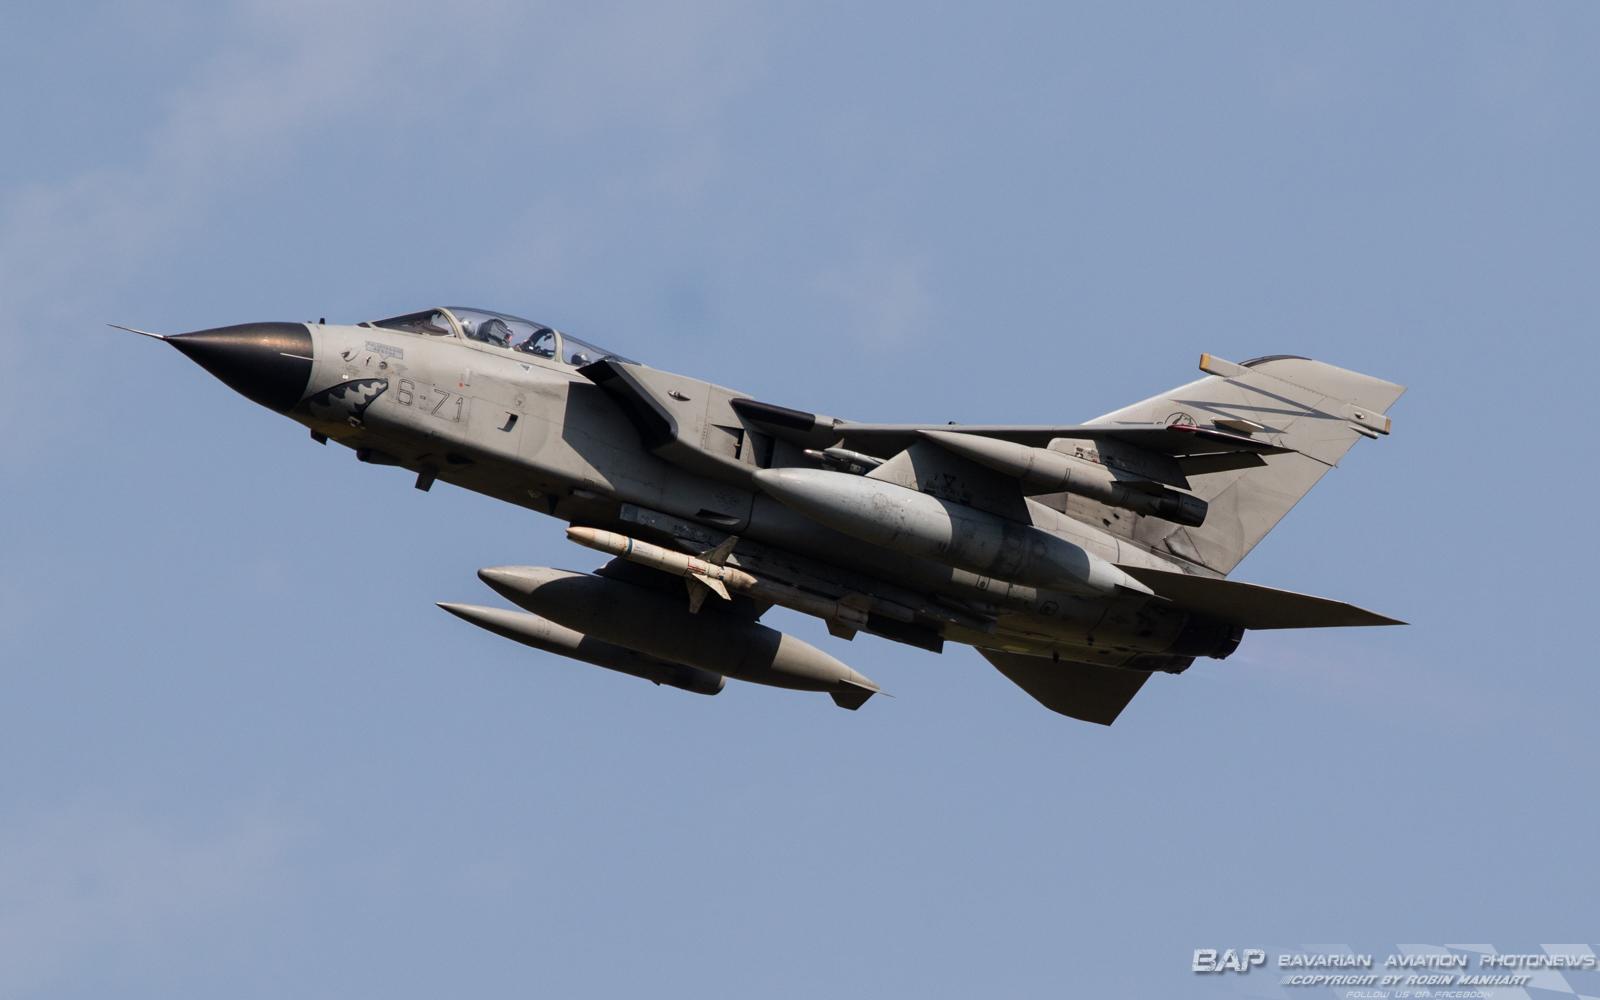 MM7070 6-71 Tornado ECR/IT 155°Gruppo / 6th Stormo @ Lechfeld (LCH/ETSL)